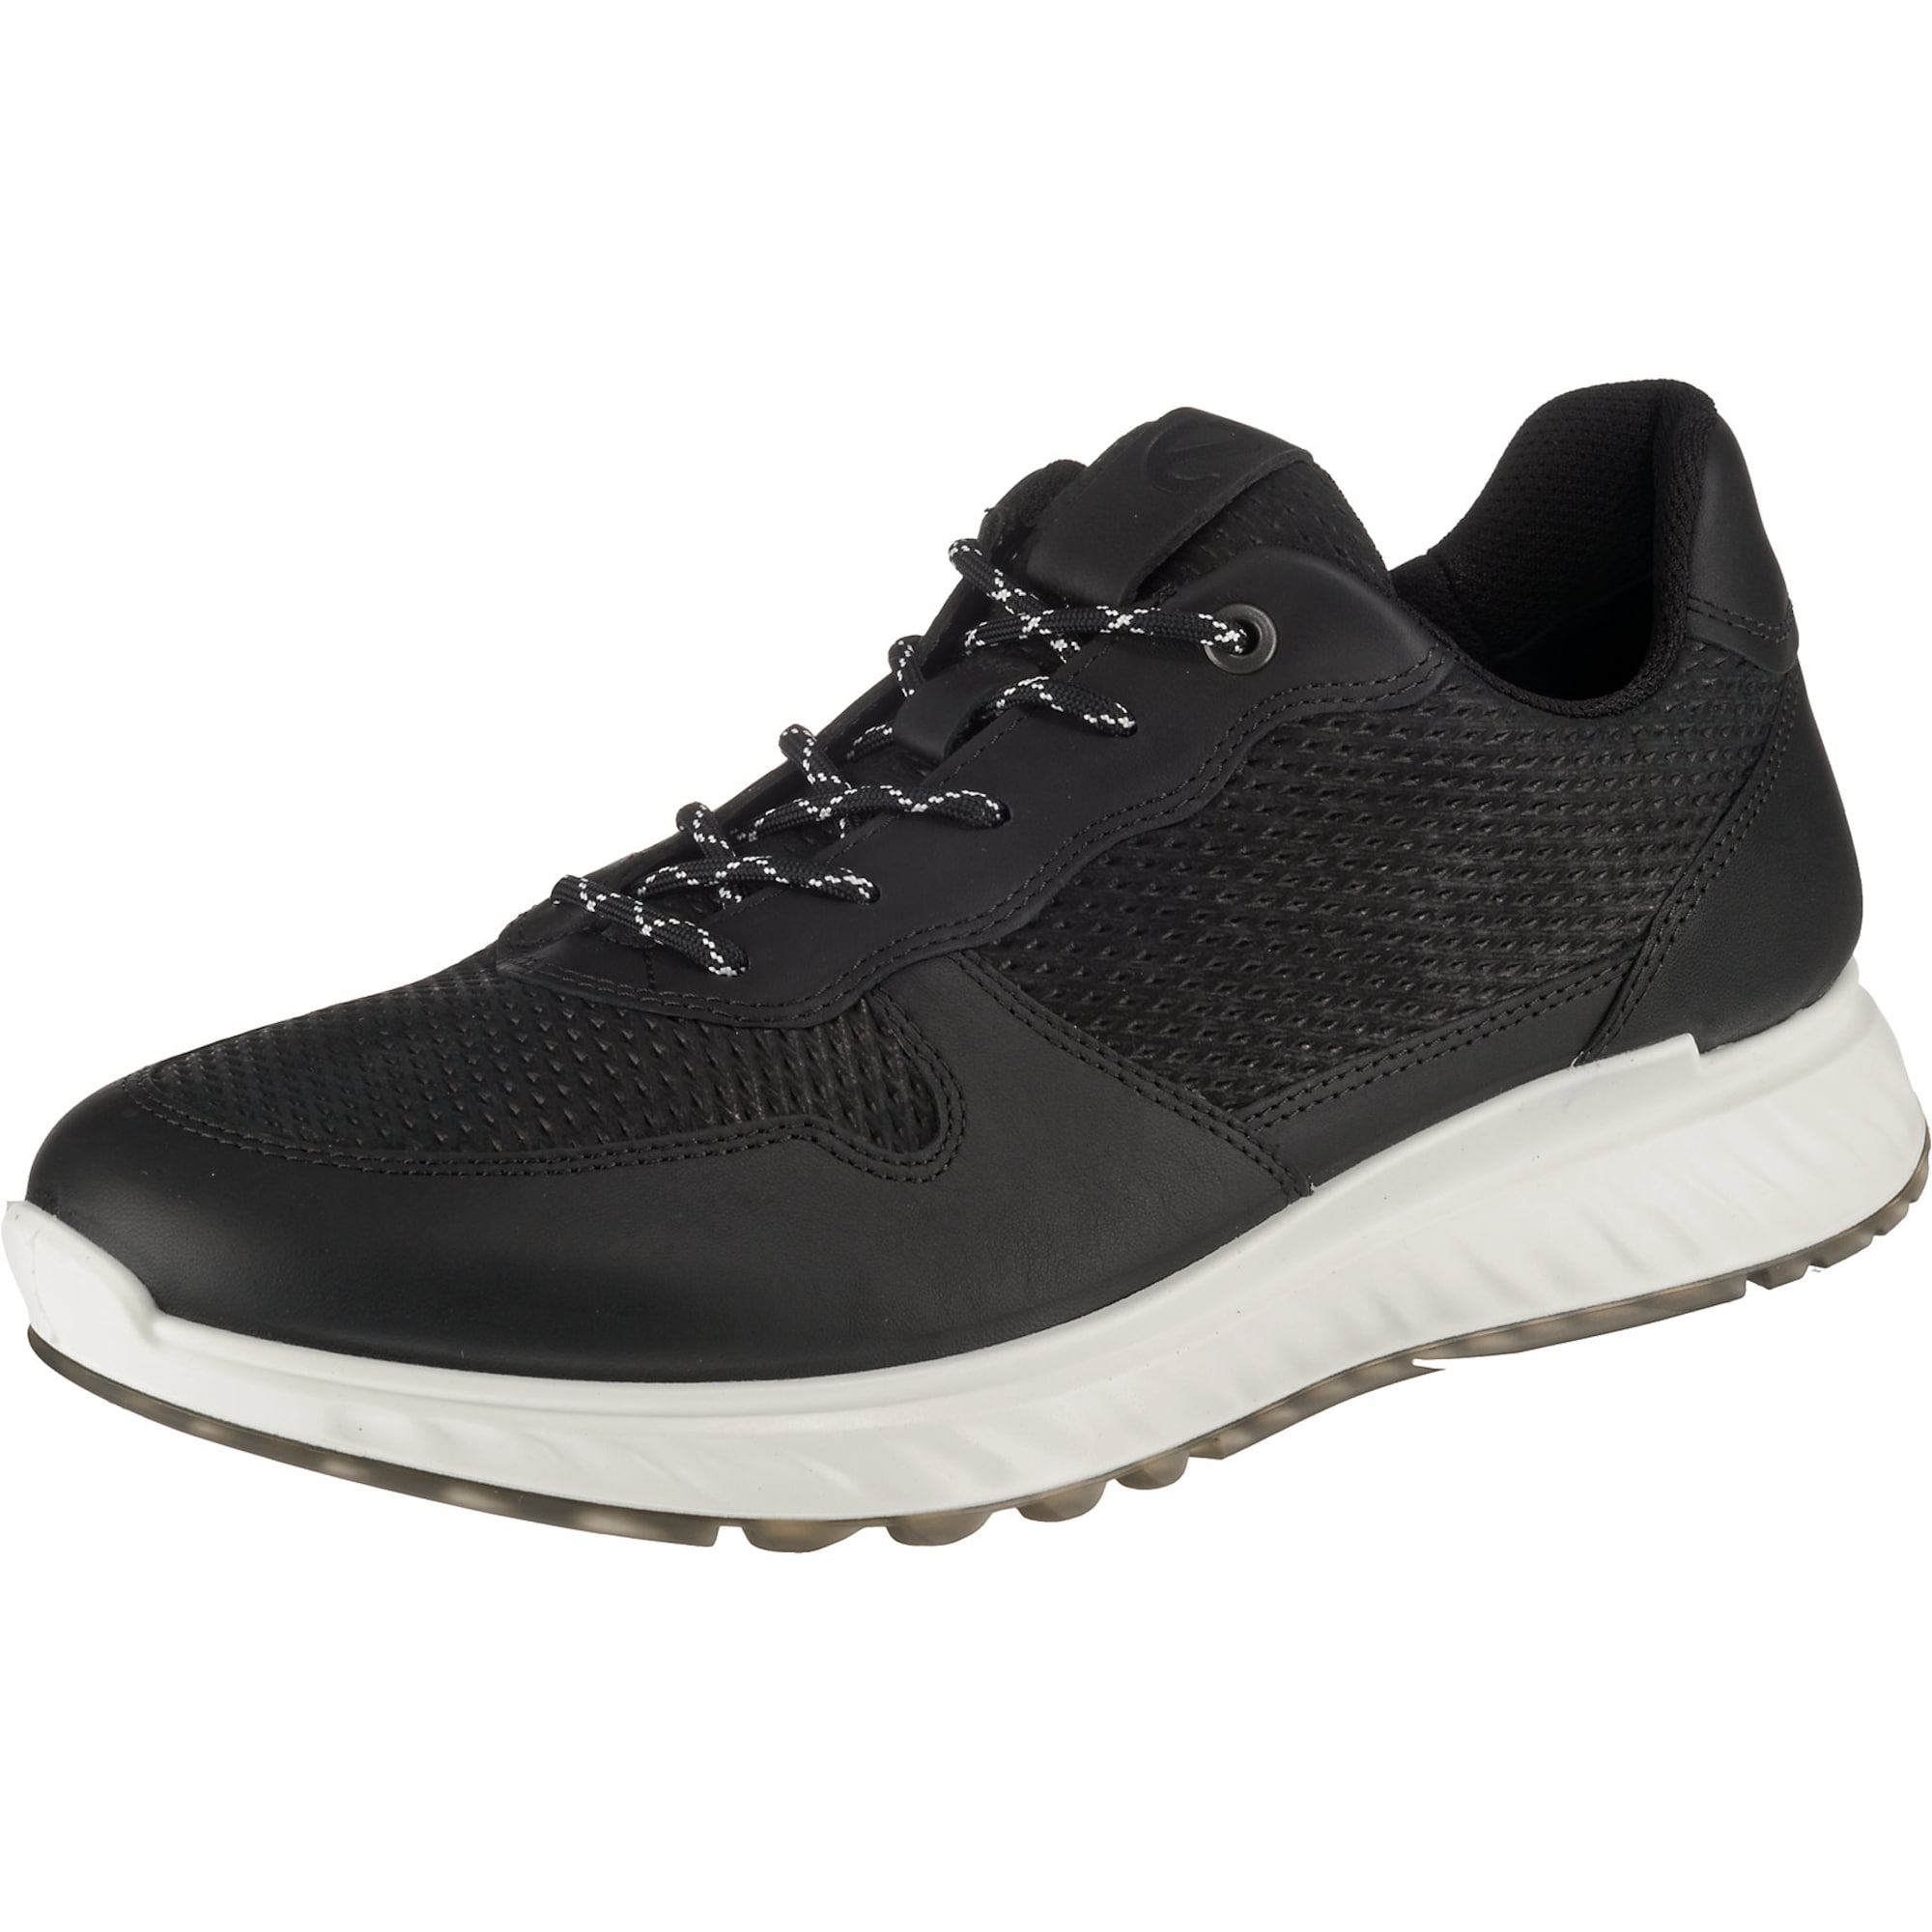 Schnürschuhe 'St. 1 Hybrid'   Schuhe > Schnürschuhe   ECCO